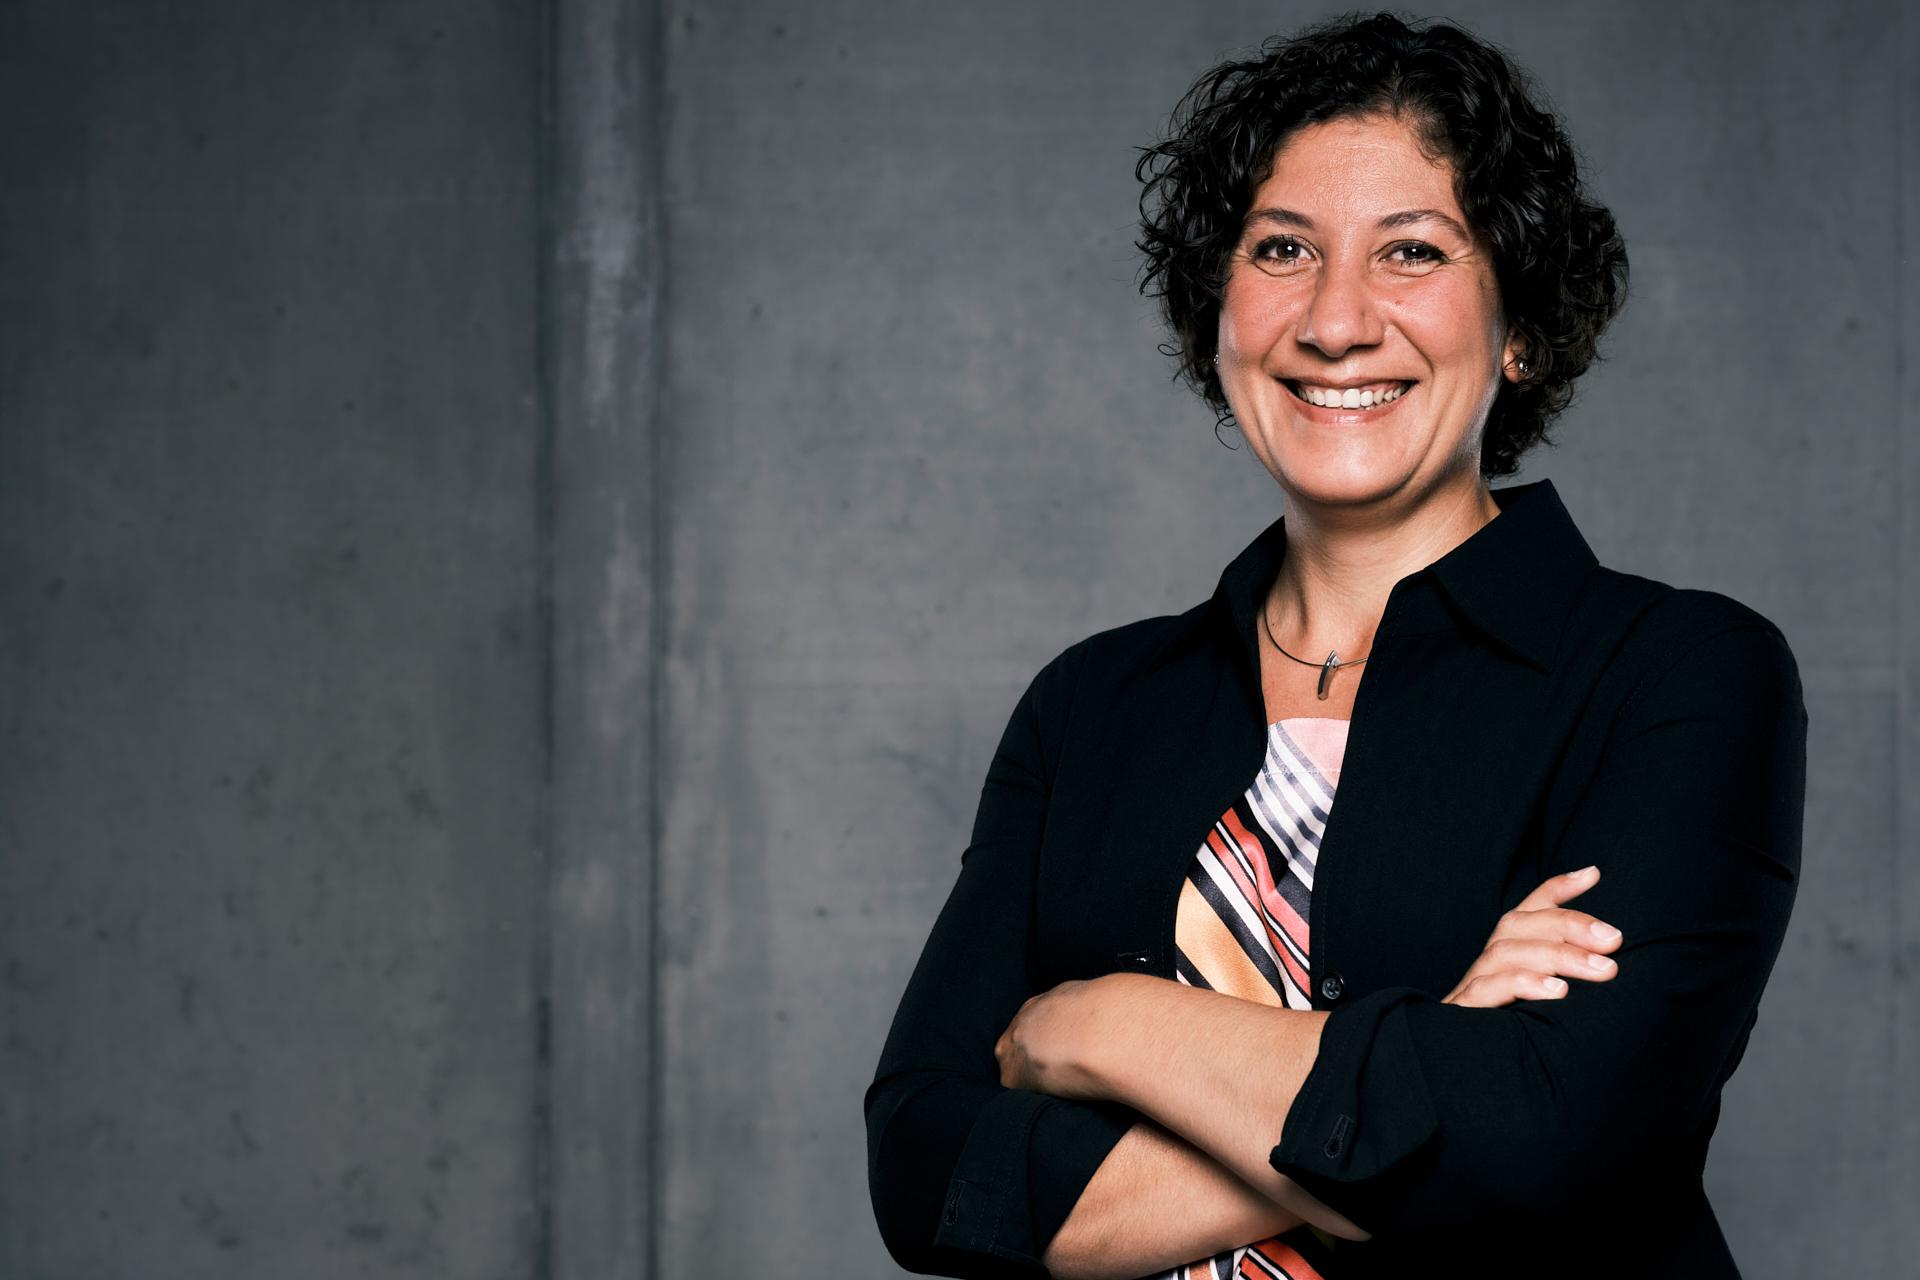 Businessfotografie Frau, Frauen Businessportrait, Businessportrait